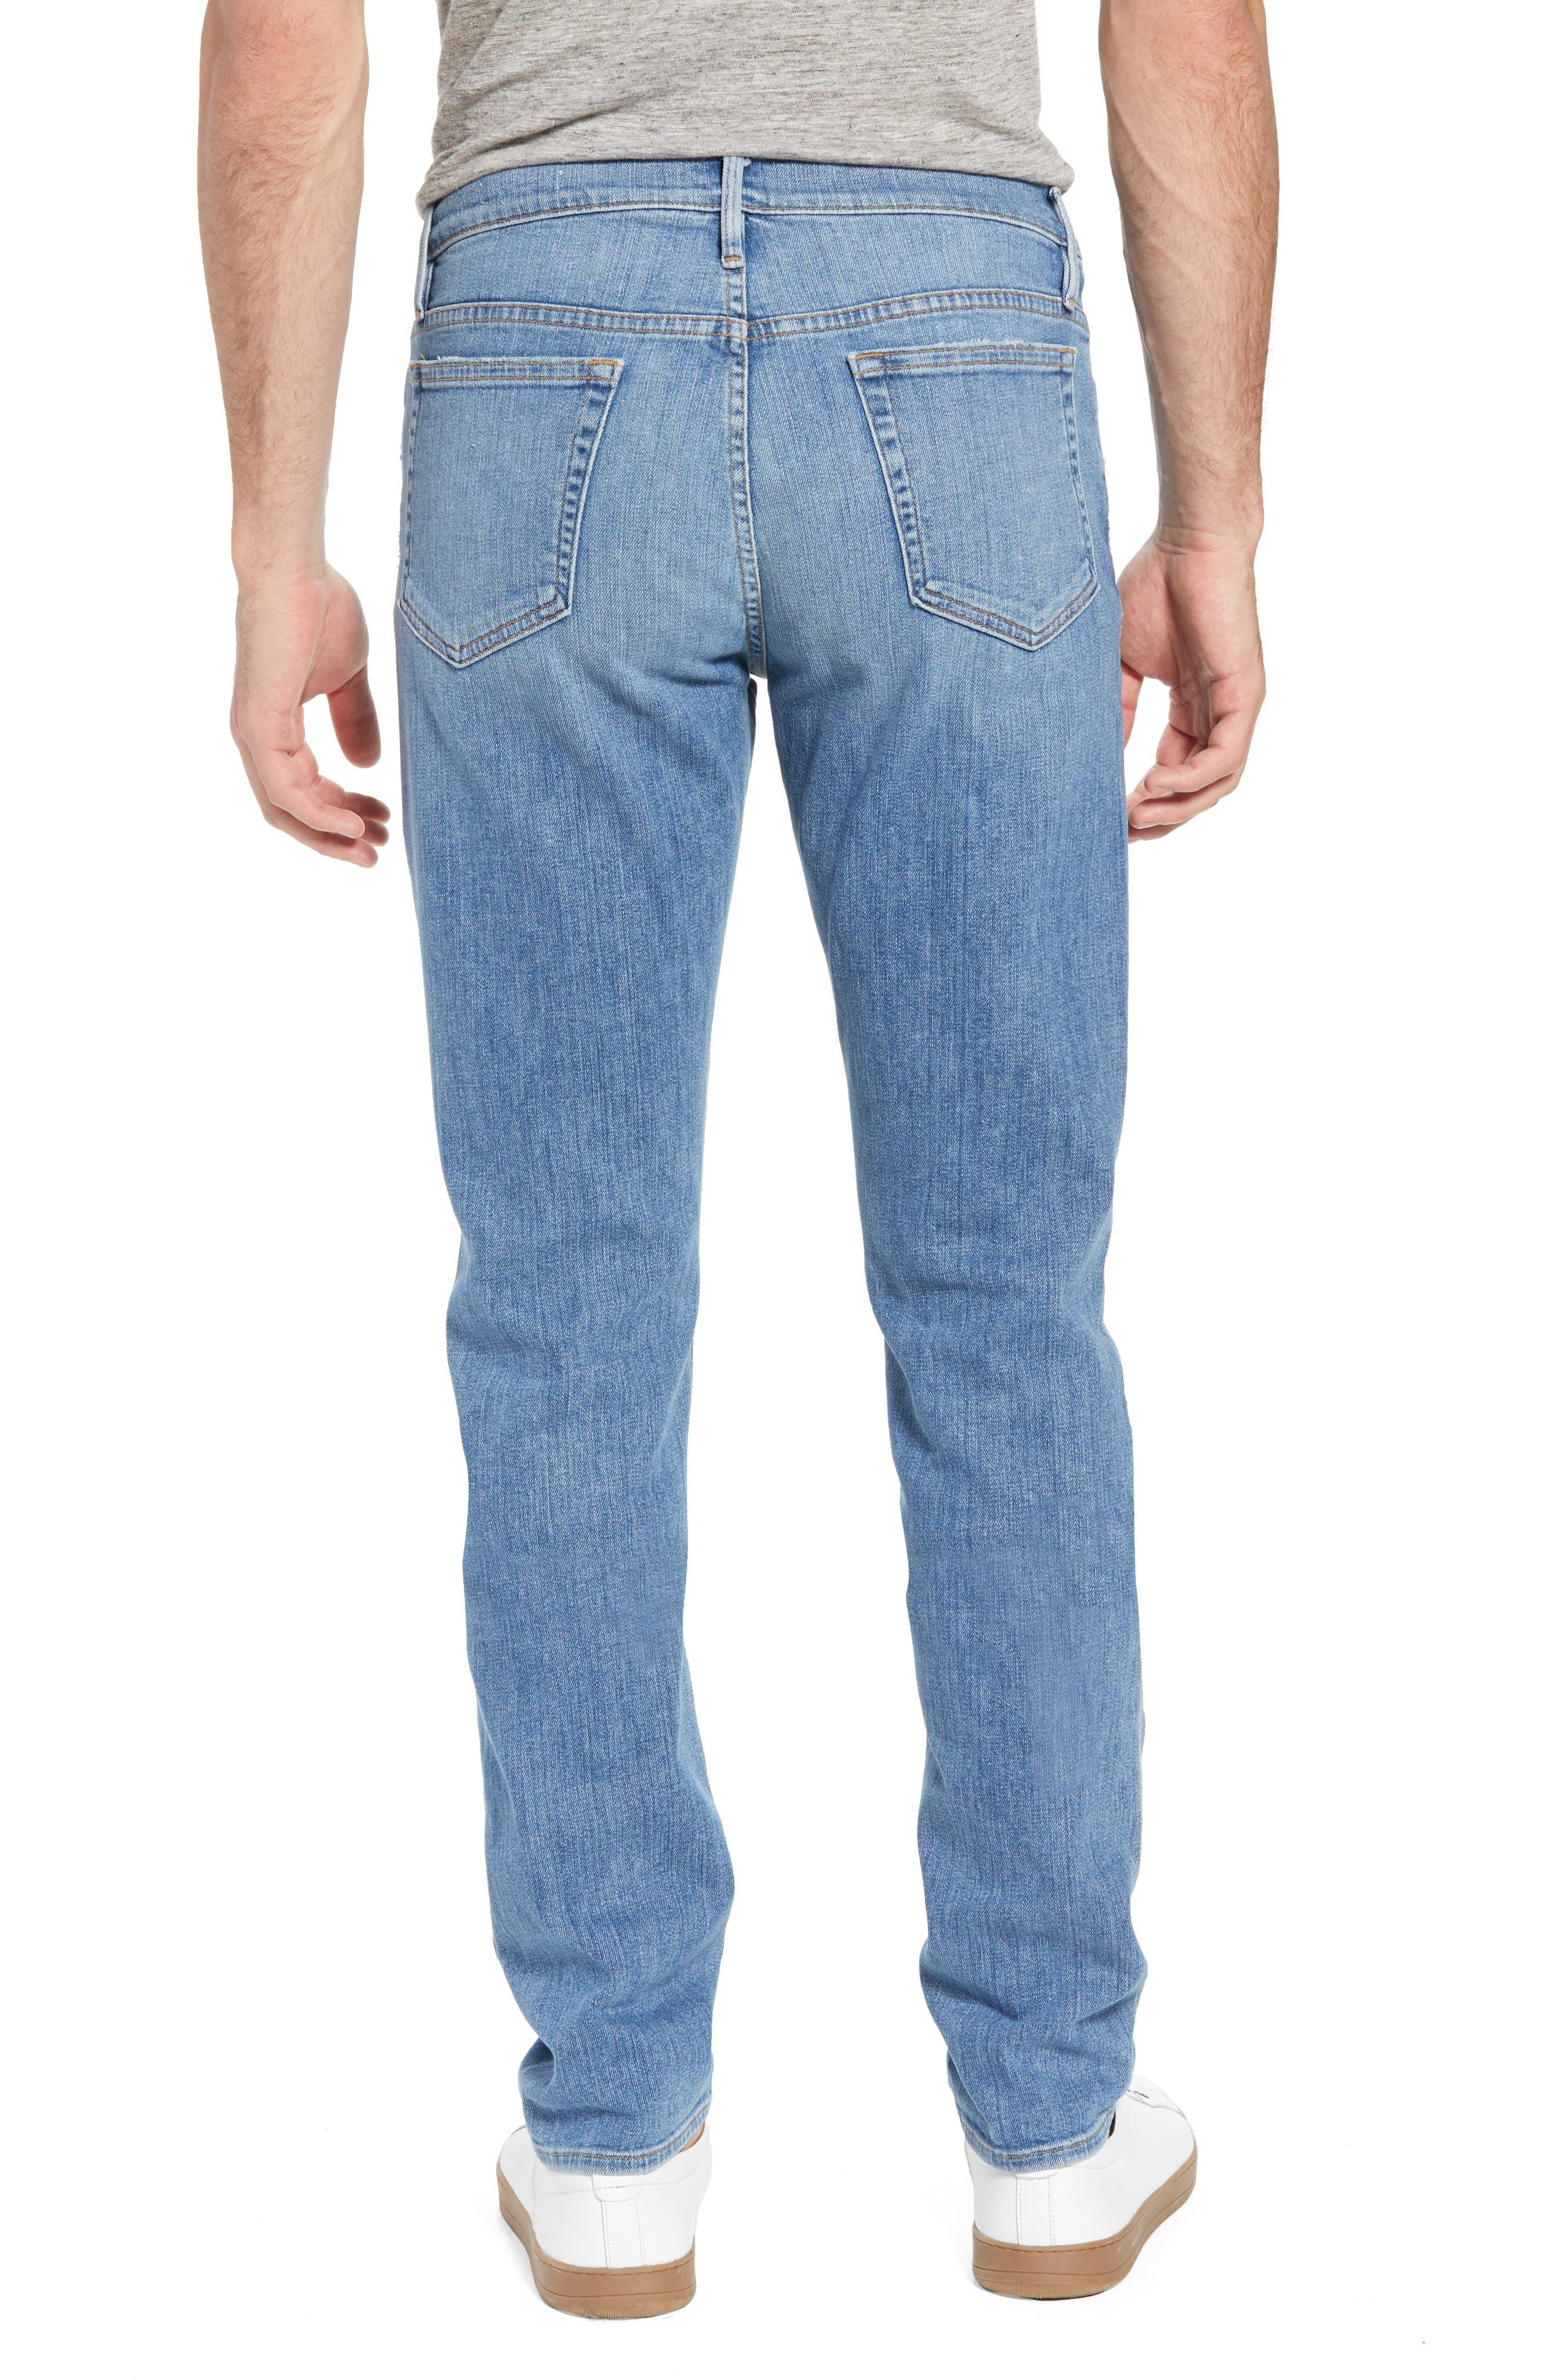 L'Homme Slim Straight Fit Jeans,                             Alternate thumbnail 2, color,                             Russel Cave